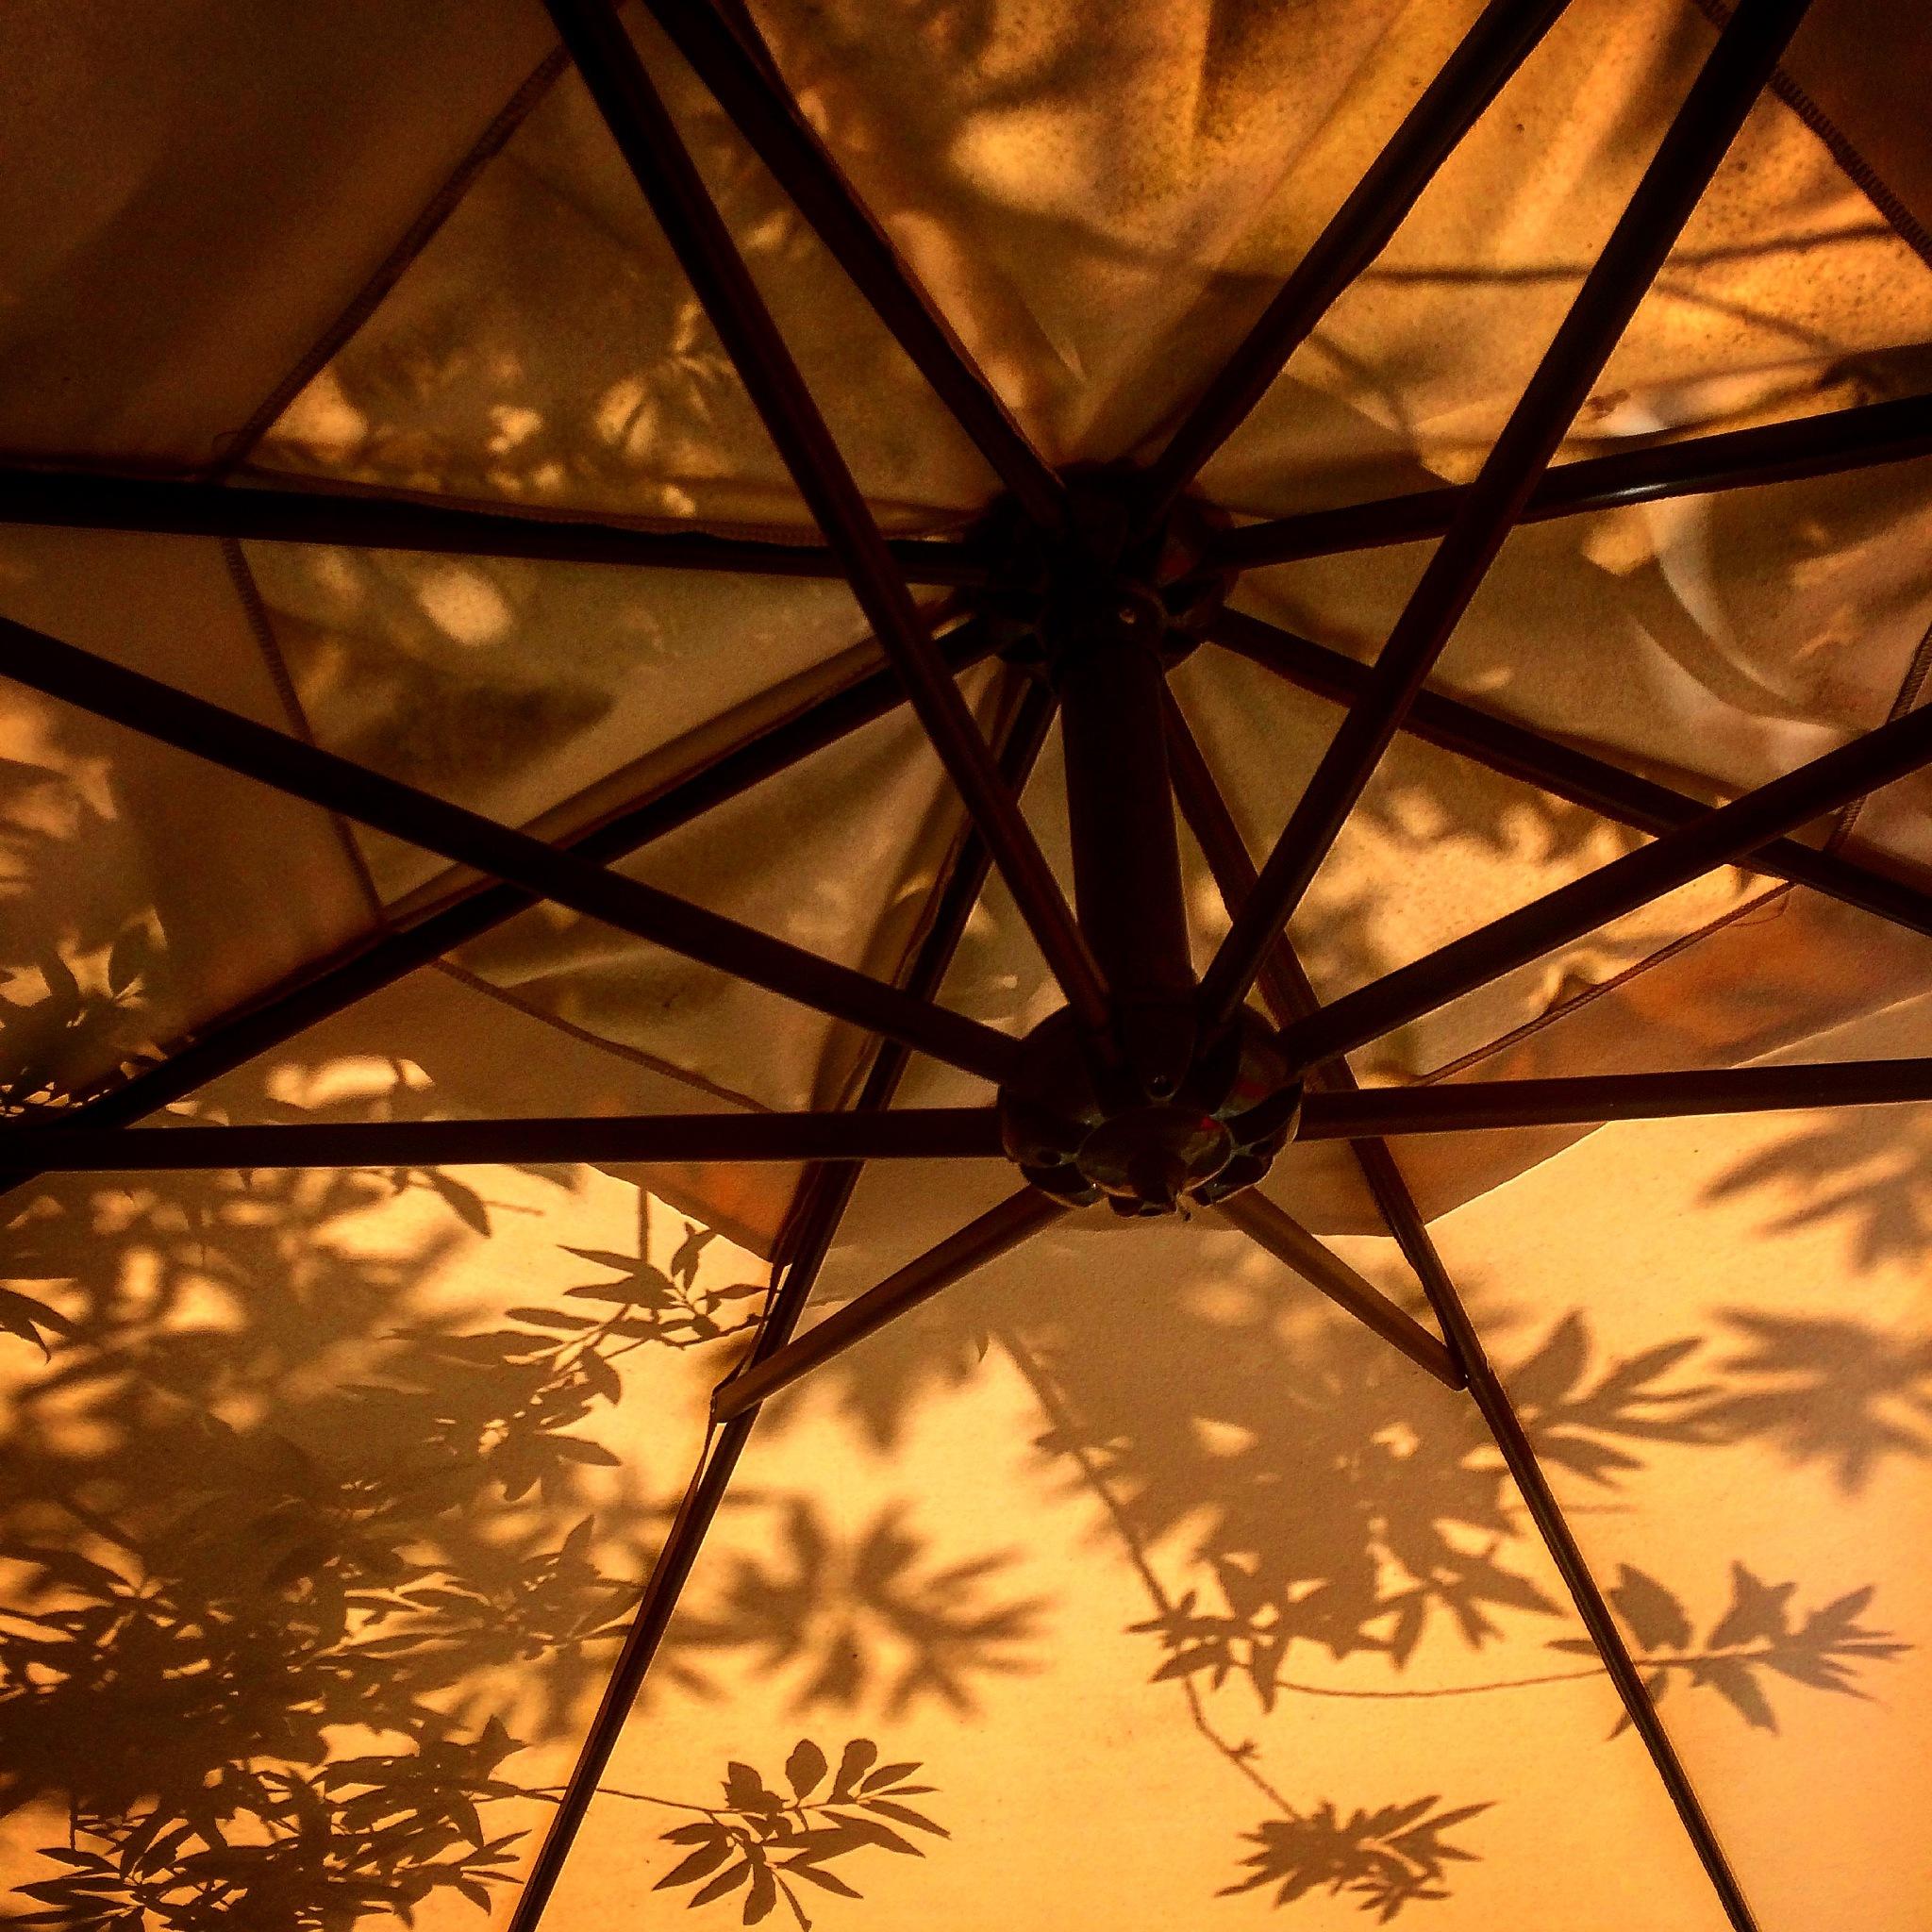 #underrheumbrella by Paula haapalahti